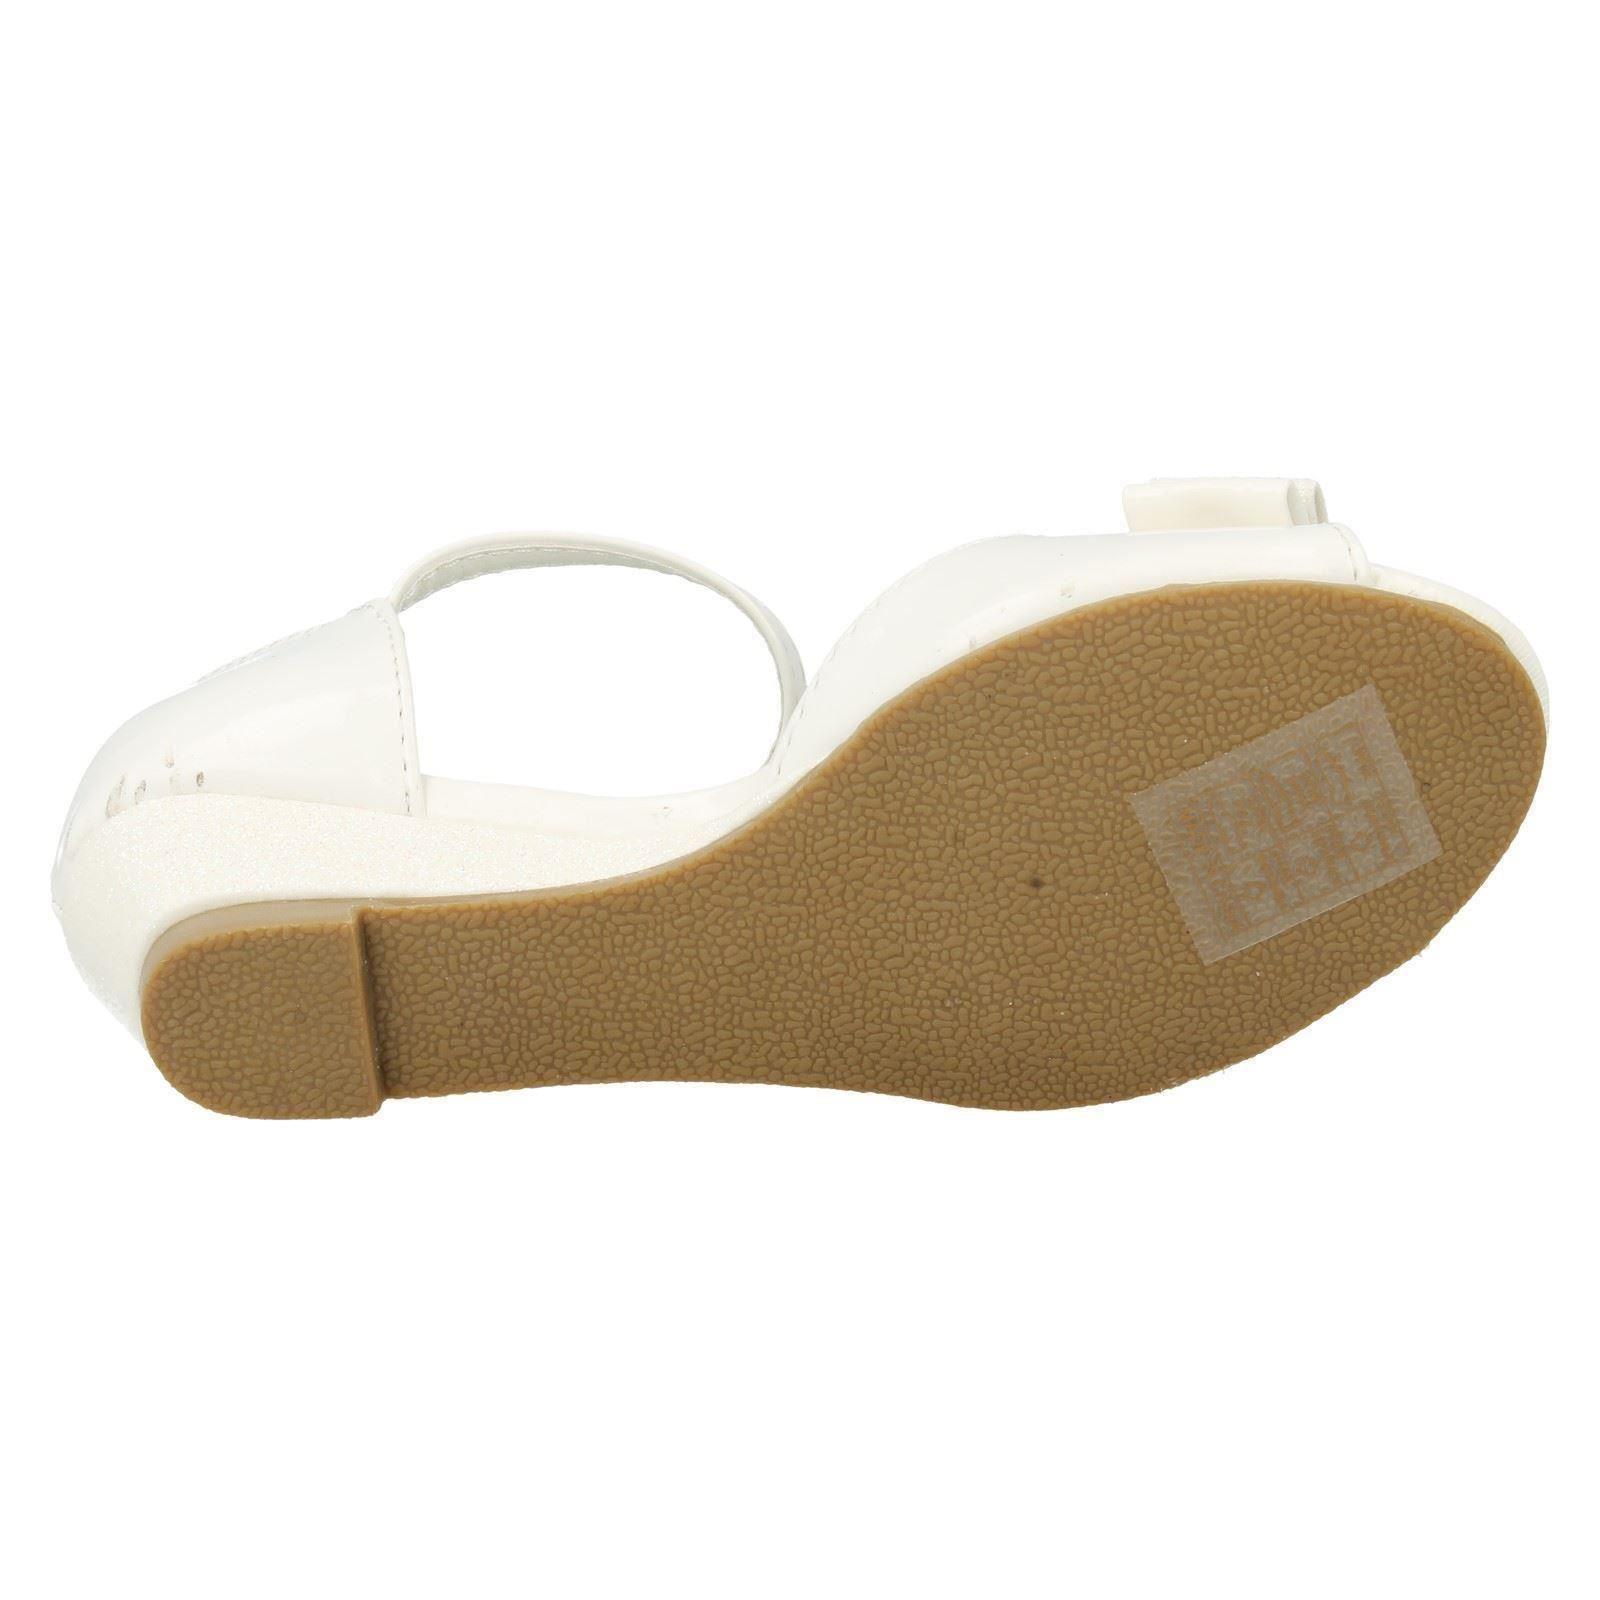 Las niñas en el clavo Sandalias Con Detalle De Moño Etiqueta h1077